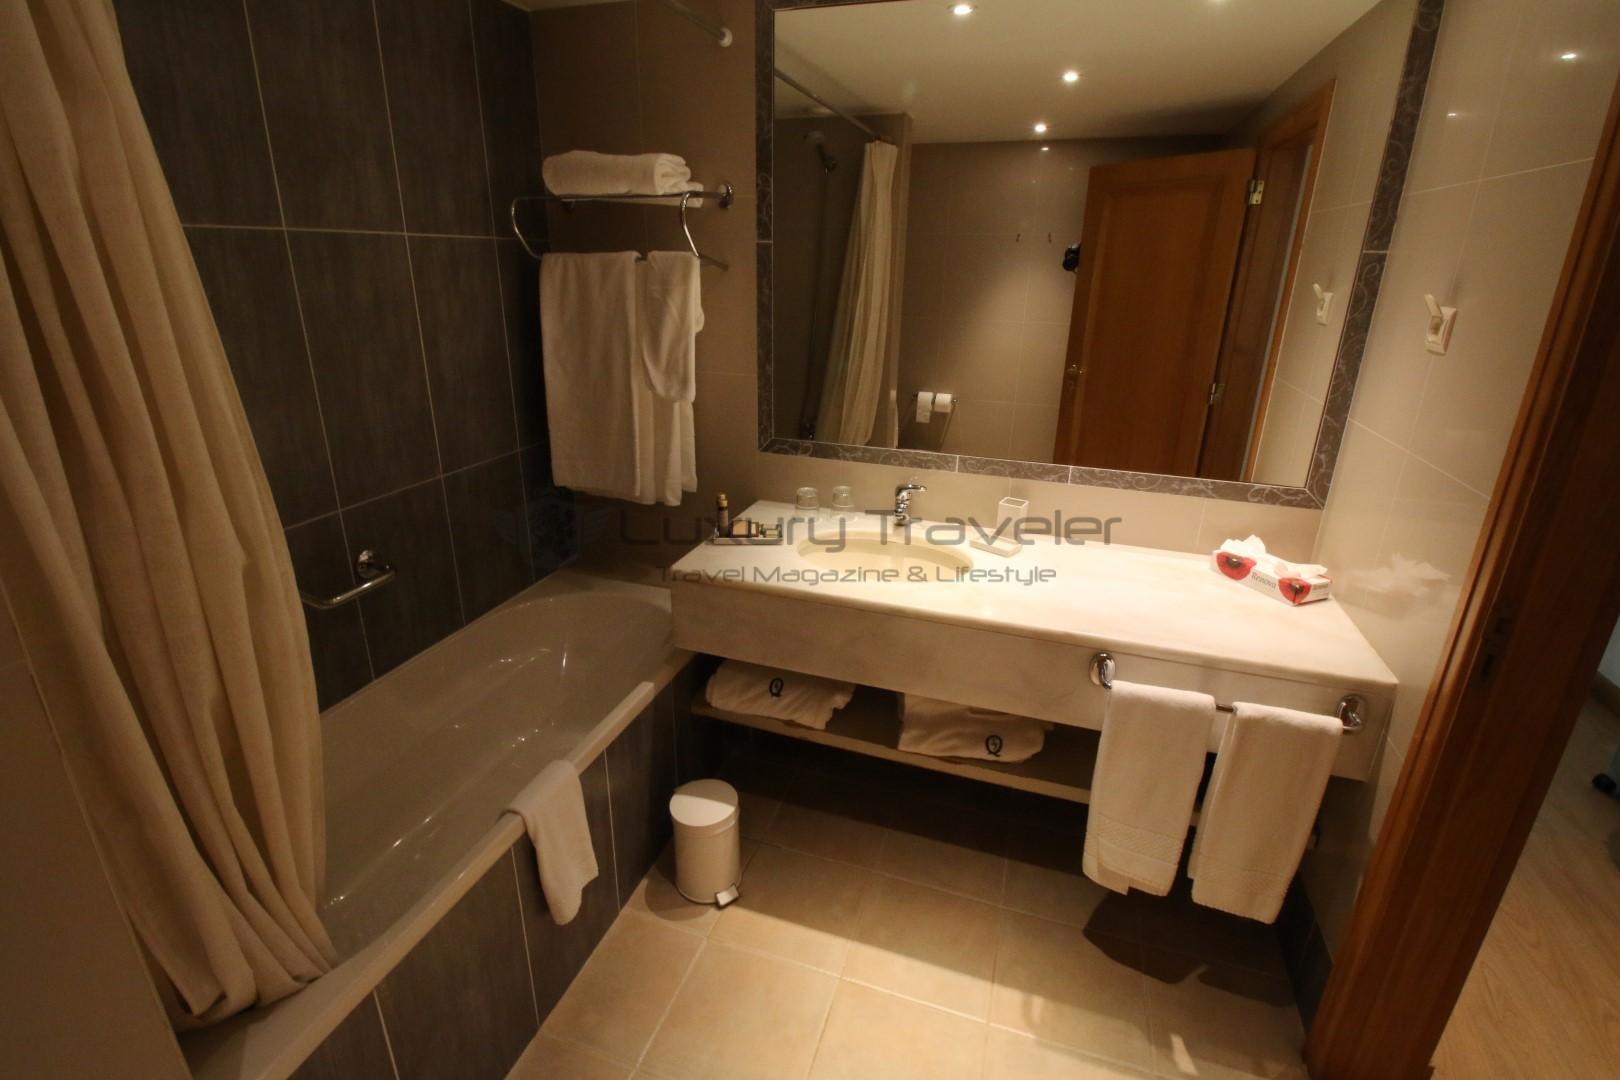 quintinha_sao_joao_funchal_madeira_hotel_island_luxury